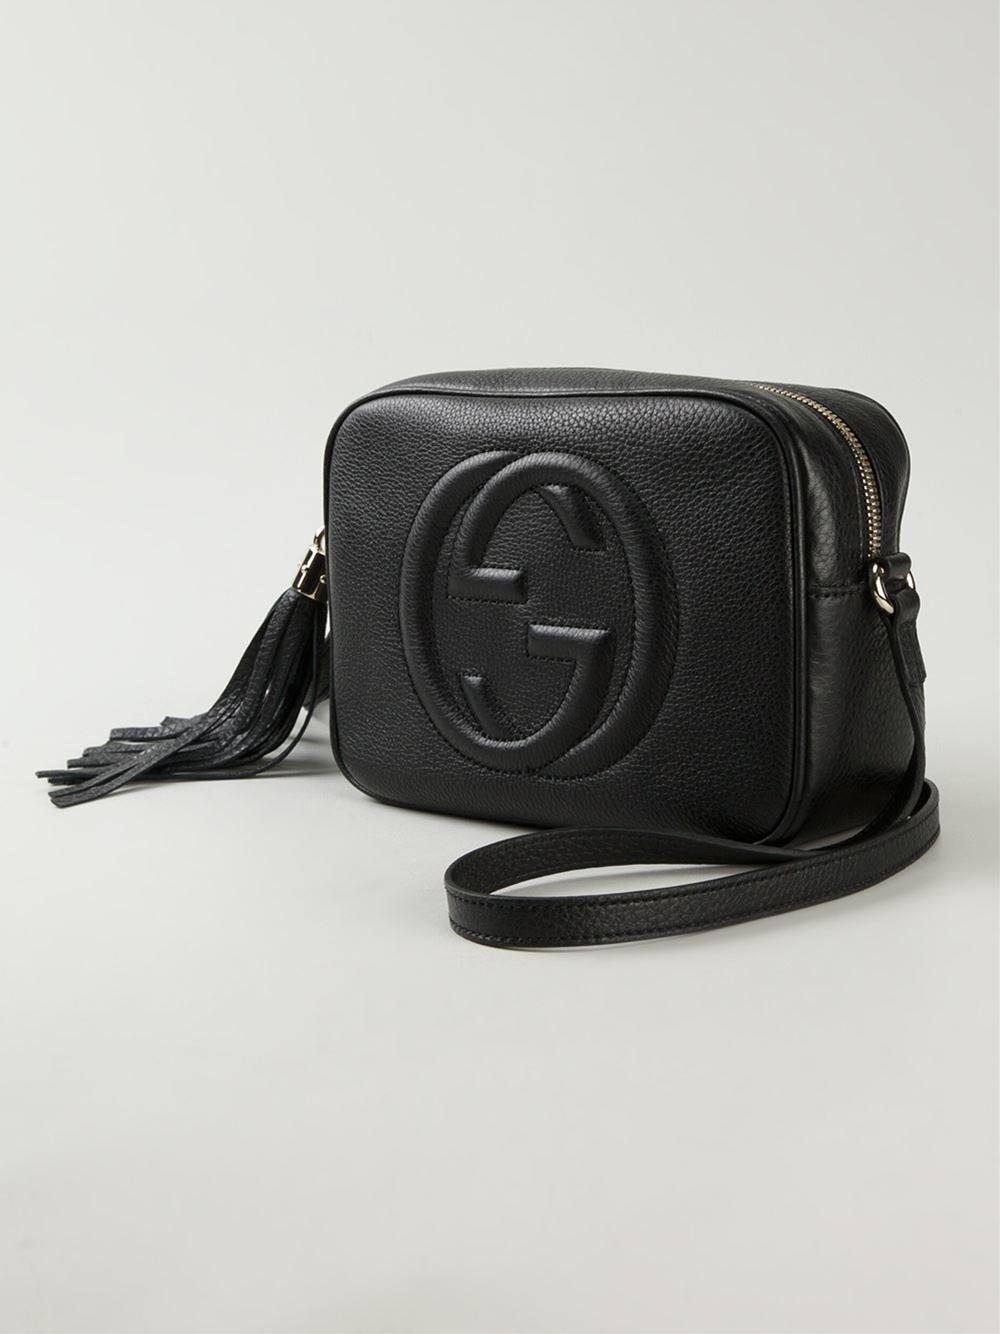 05eef73fa57 Lyst - Gucci Soho Leather Cross-body Bag in Black